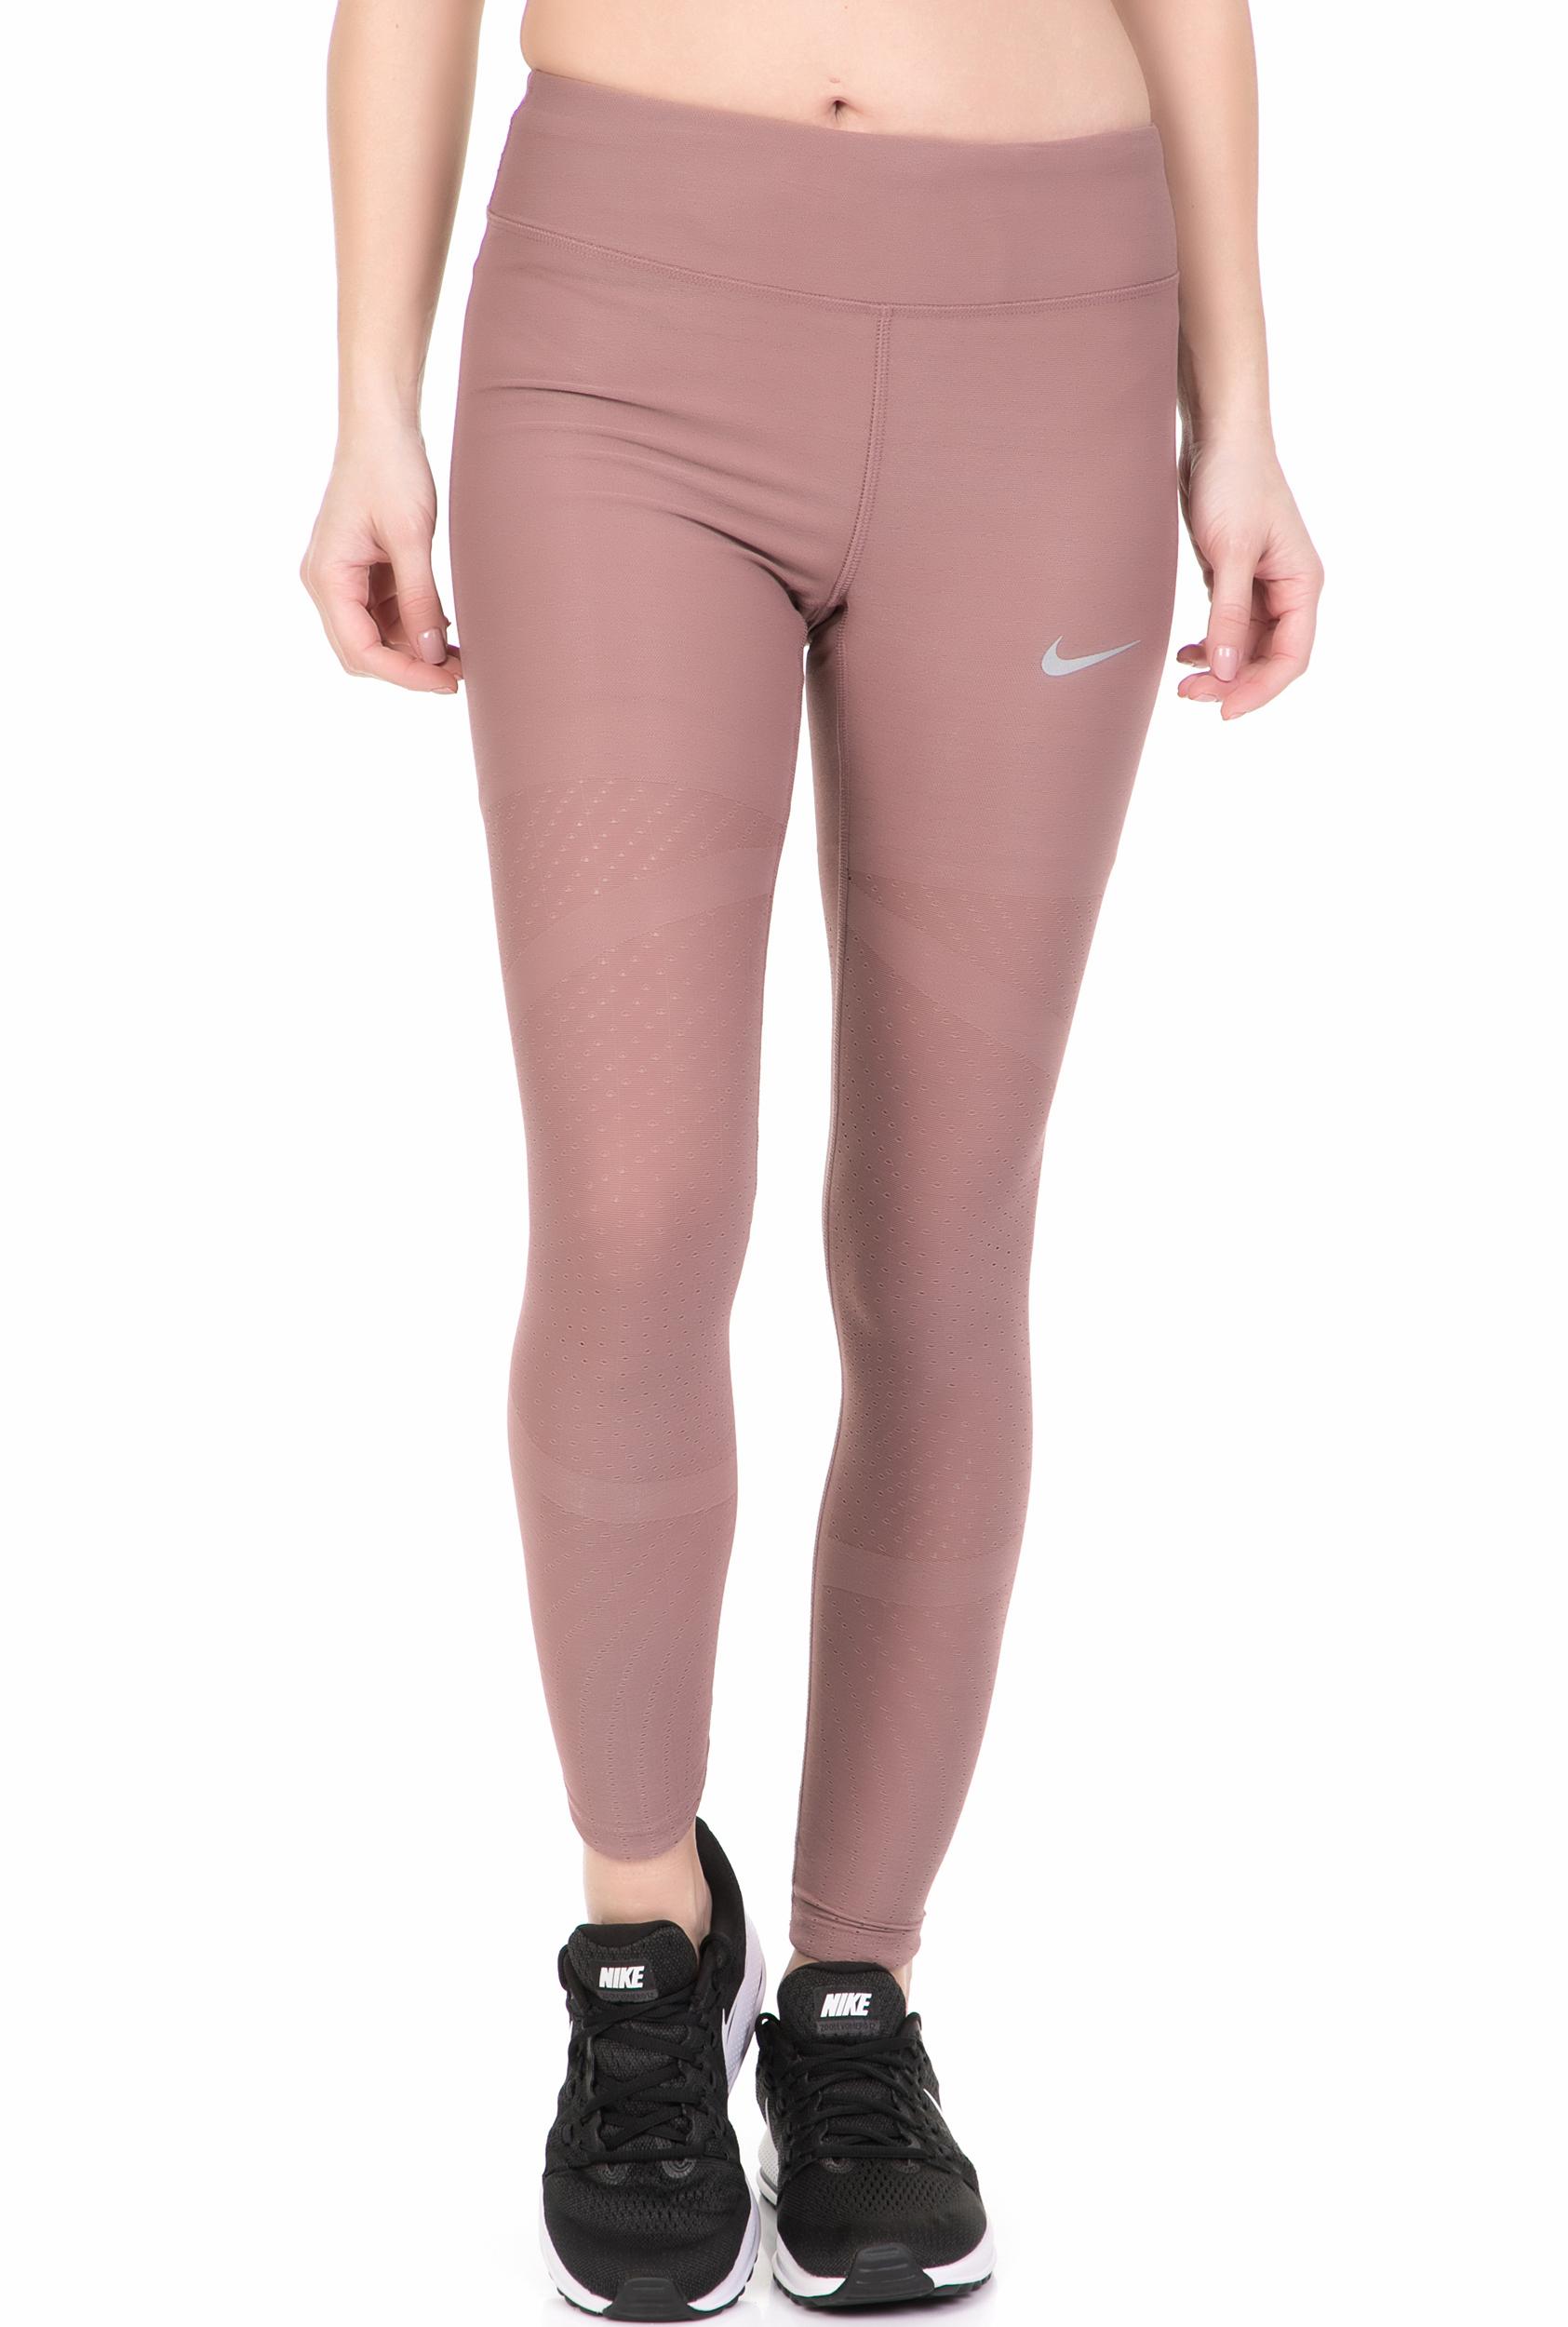 88ed097ebc8b NIKE - Γυναικείο κολάν για τρέξιμο Nike Epic Lux Athena ροζ